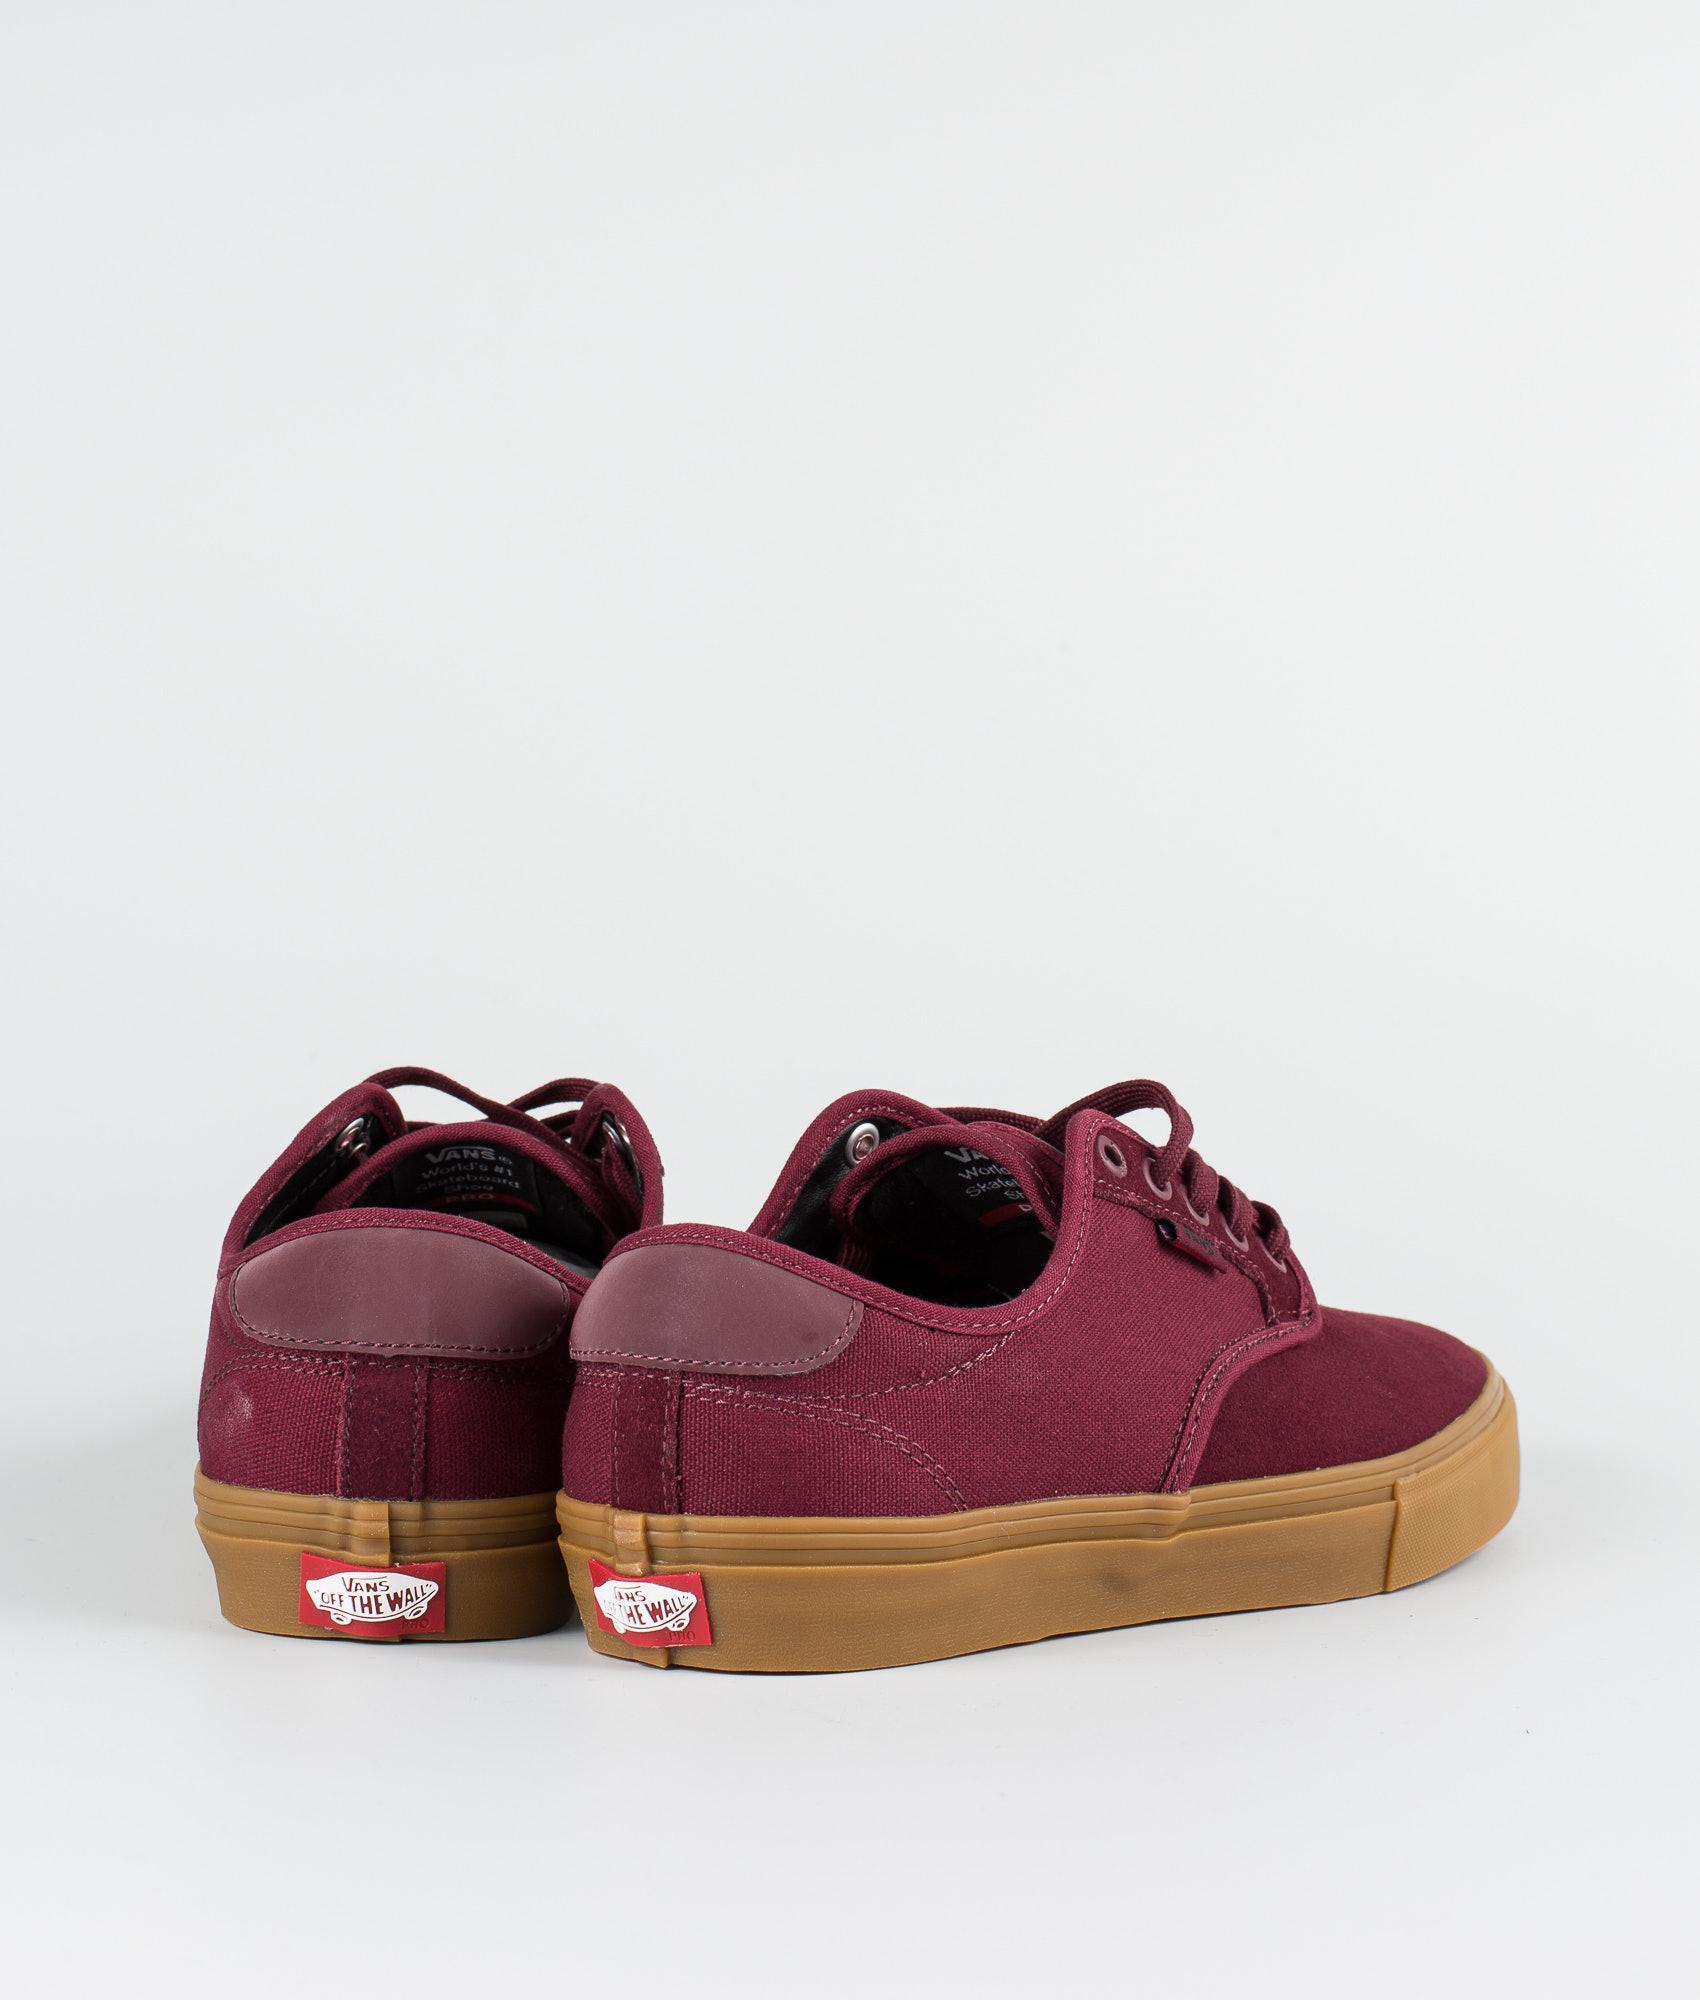 Vans Chima Ferguson Pro Shoes (Reflective) Port Royale  - Ridestore.com 55aa355a0